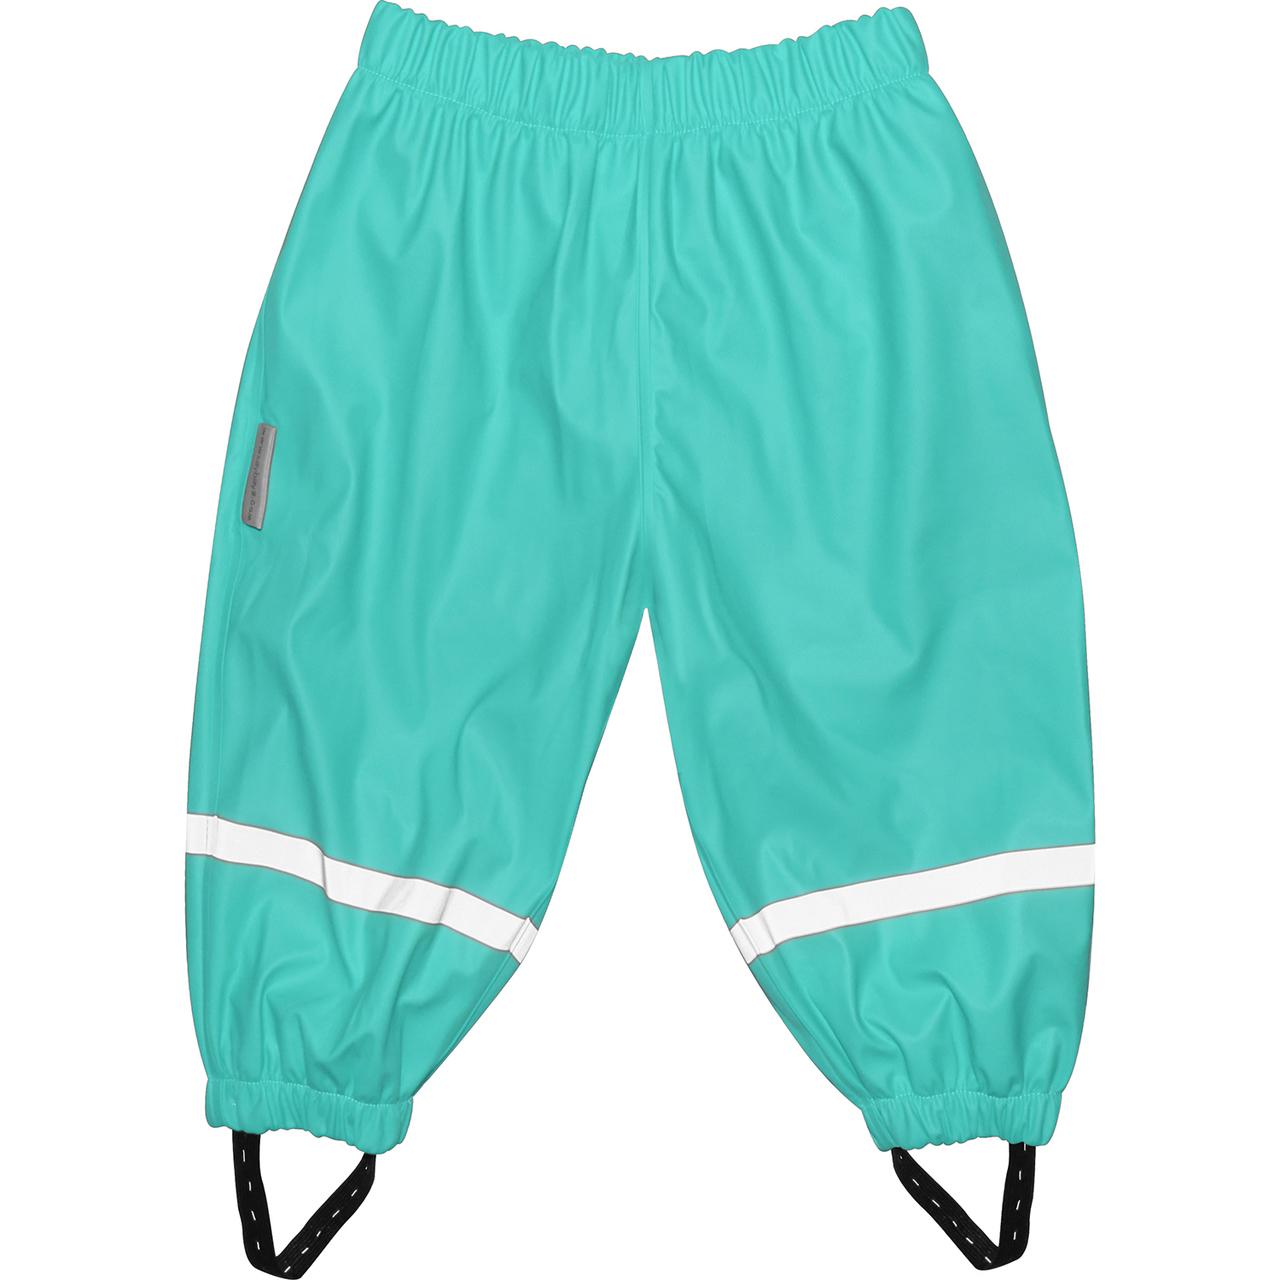 Silly Billyz Waterproof Pants - Aqua (1-2 Yrs) image